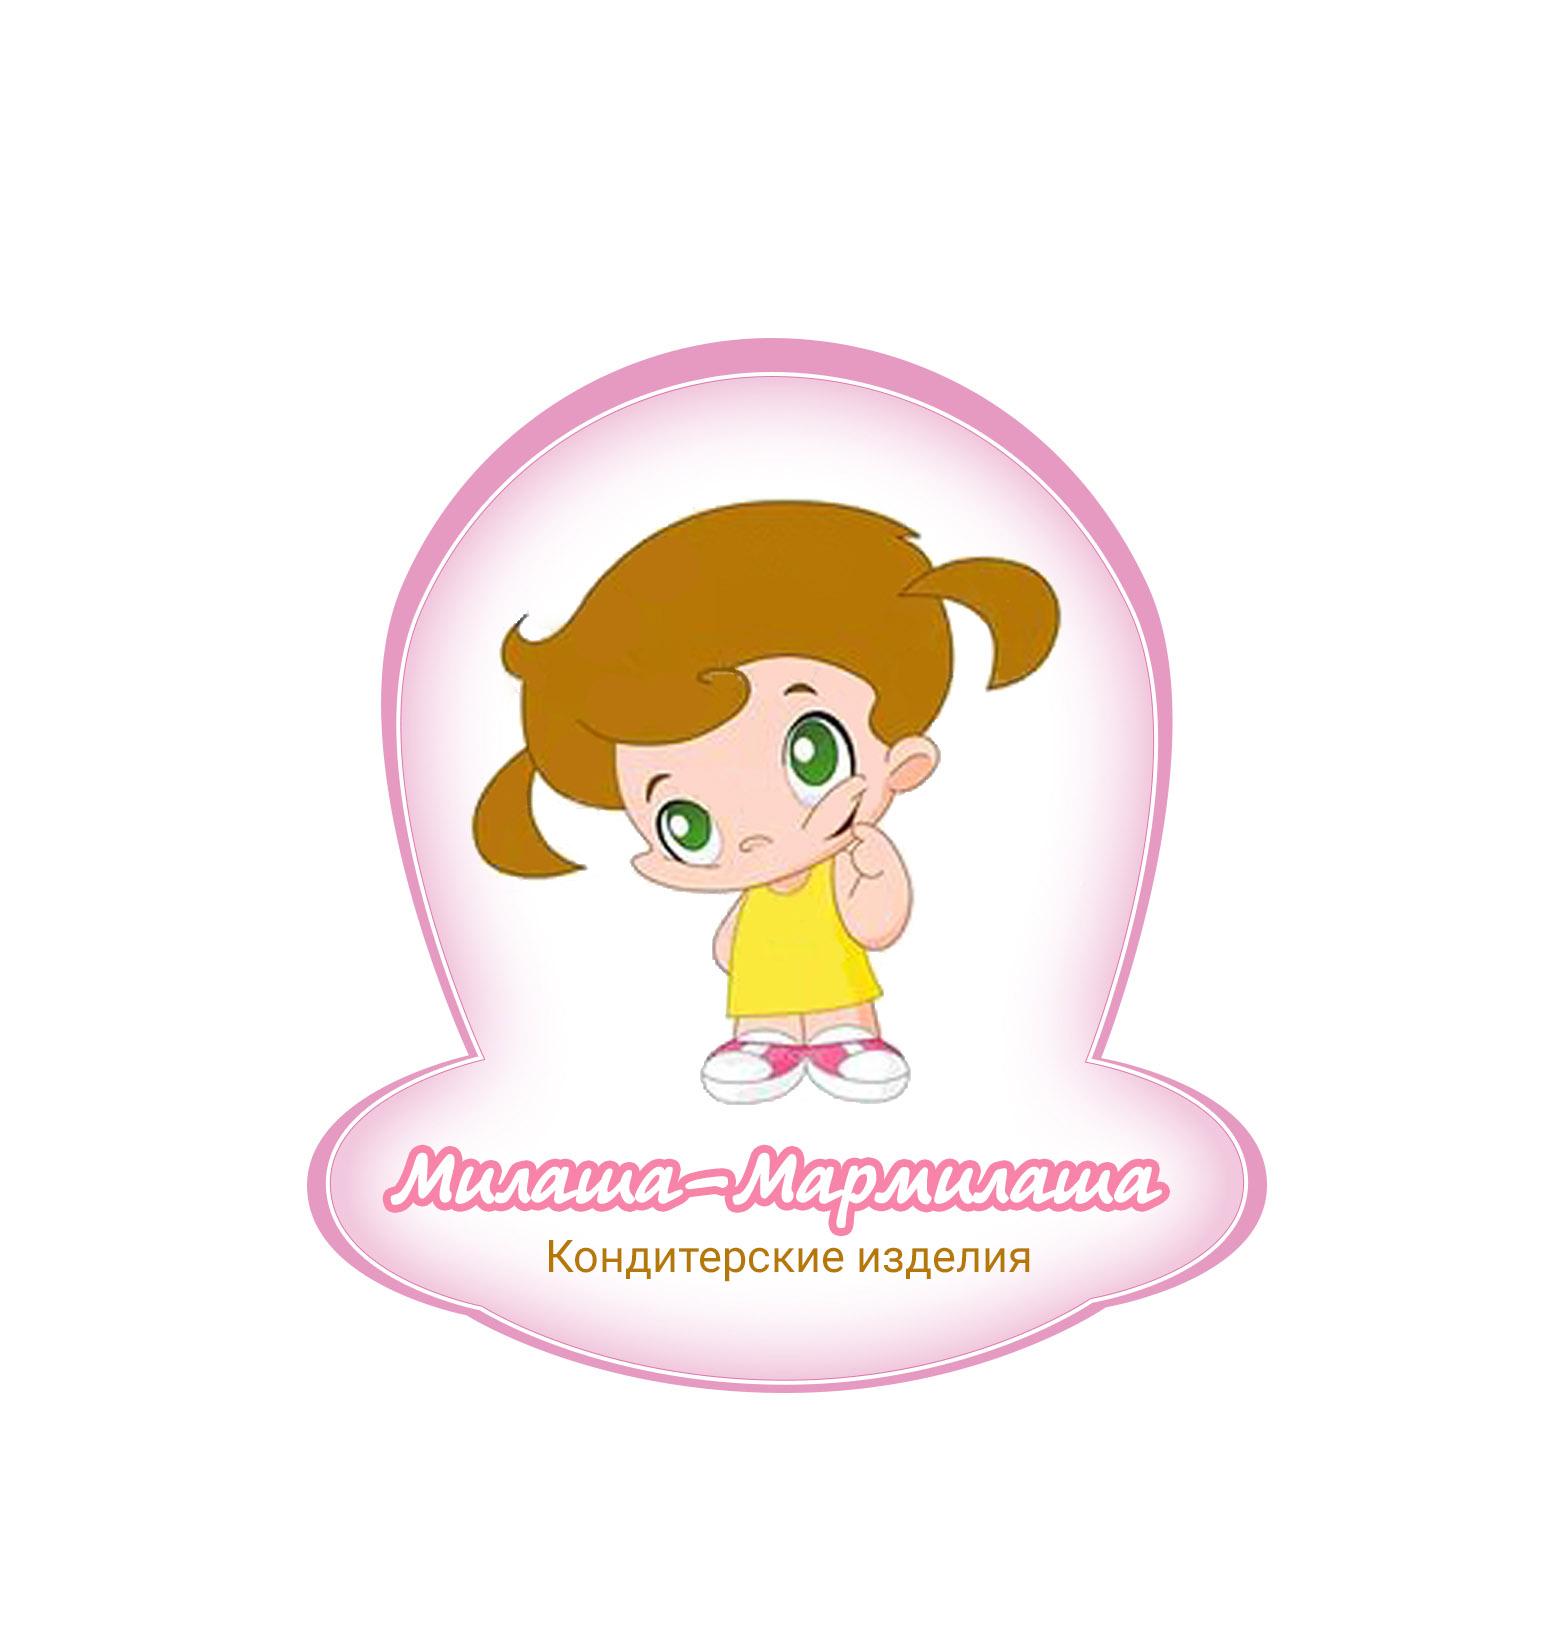 "Логотип для товарного знака ""Милаша-Мармилаша"" фото f_4145880e16a7cac3.jpg"